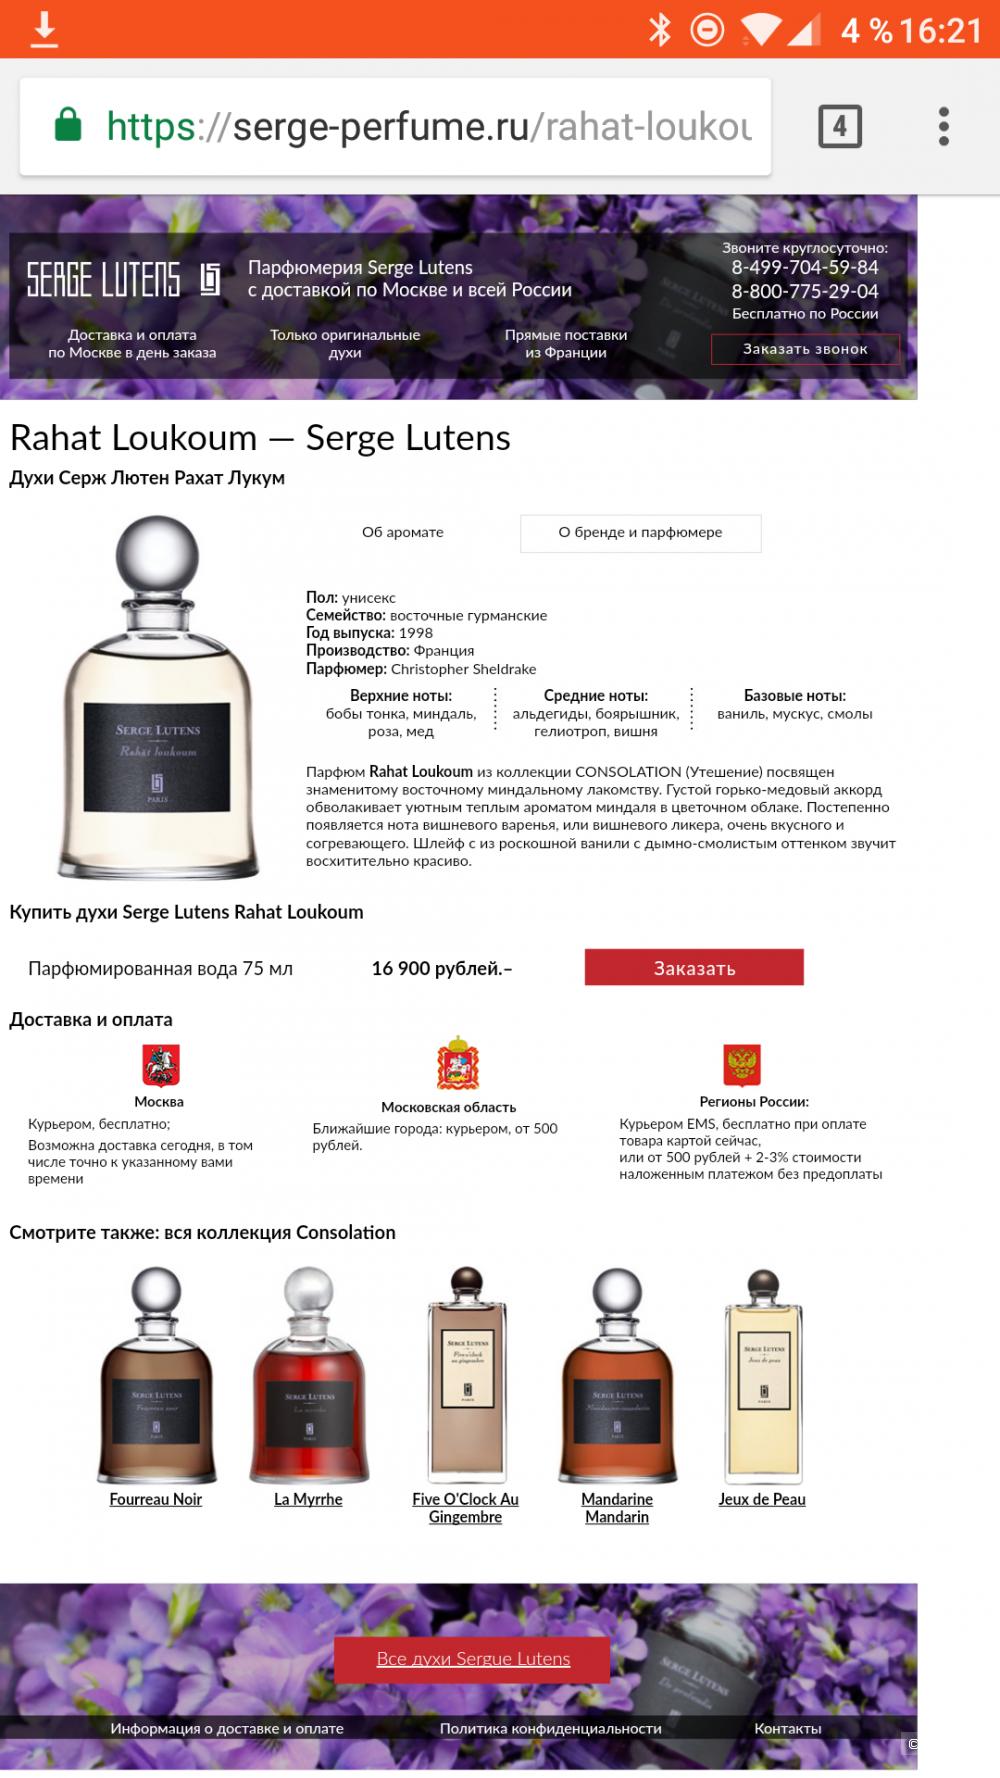 Serge Lutens Rahat Loukoum парфюм 45 из 75 мл